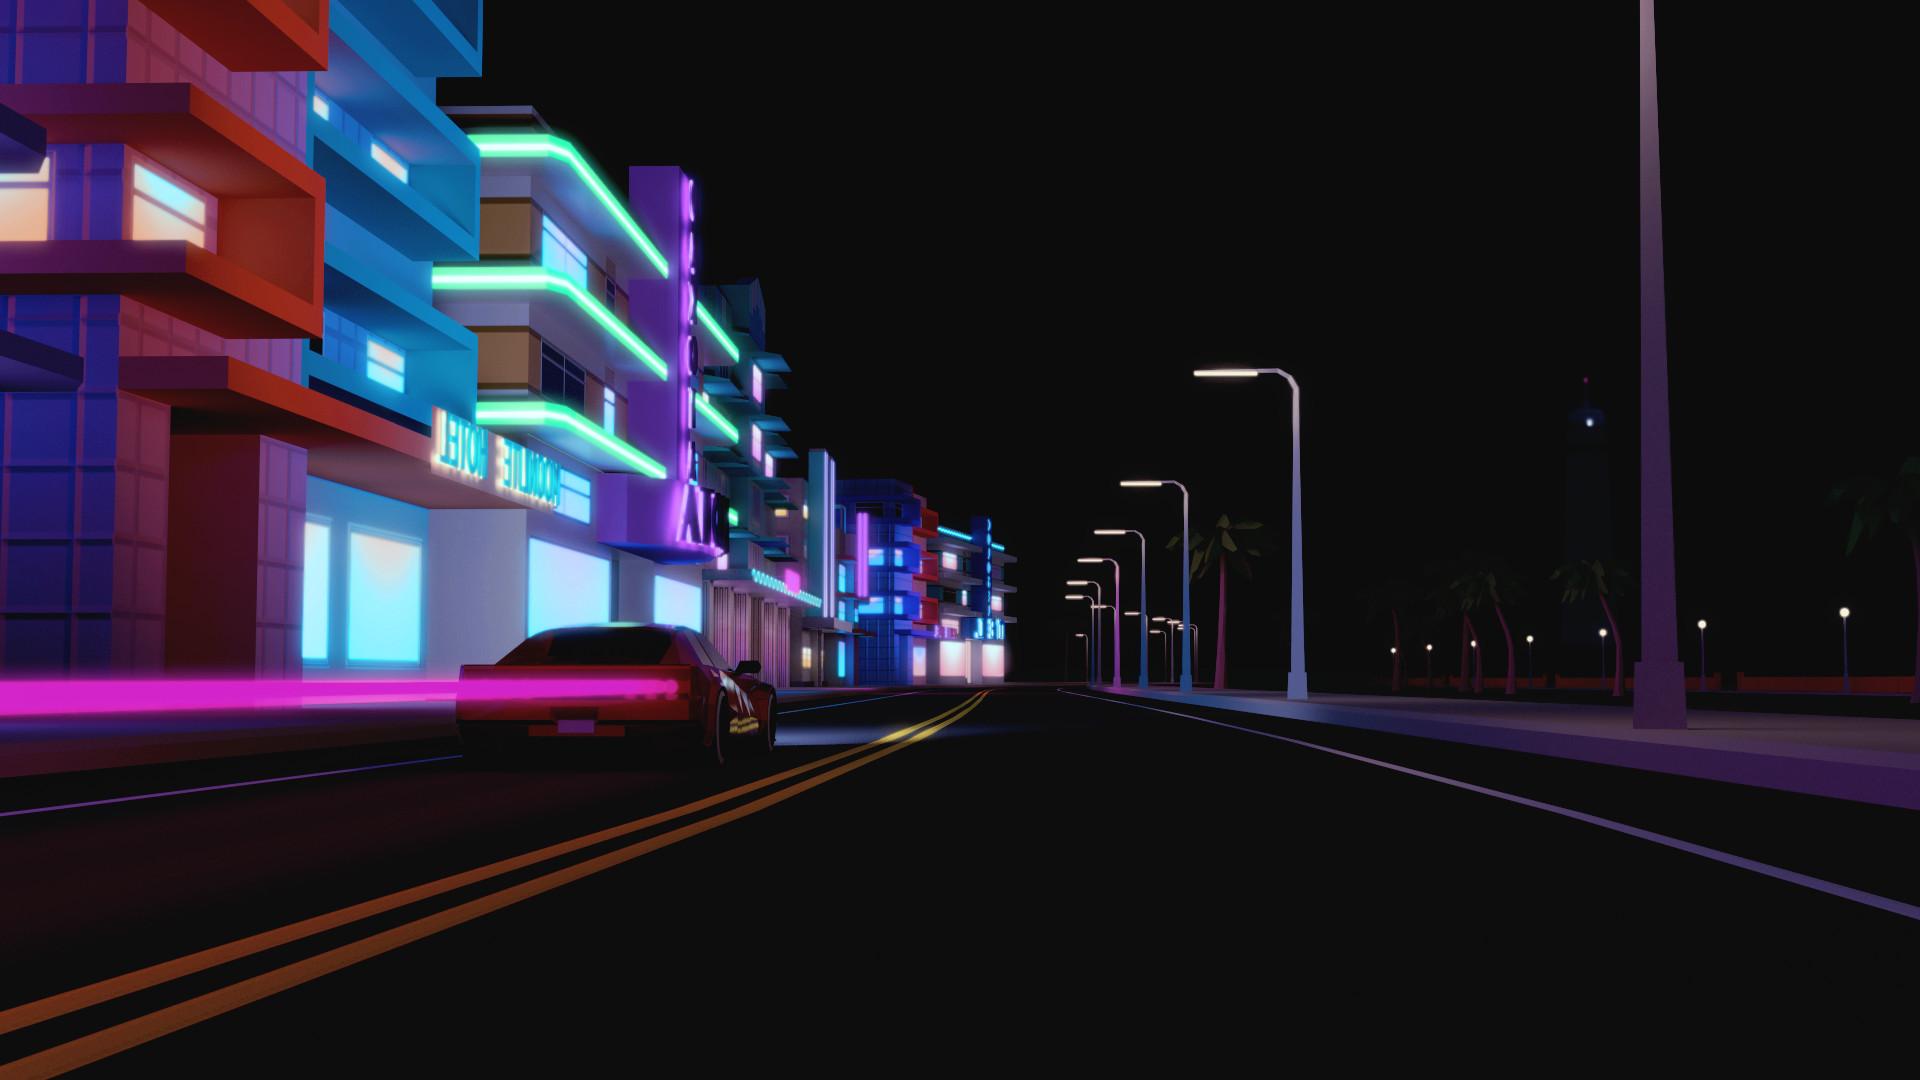 Street Wallpaper Hd Night City 66 Images